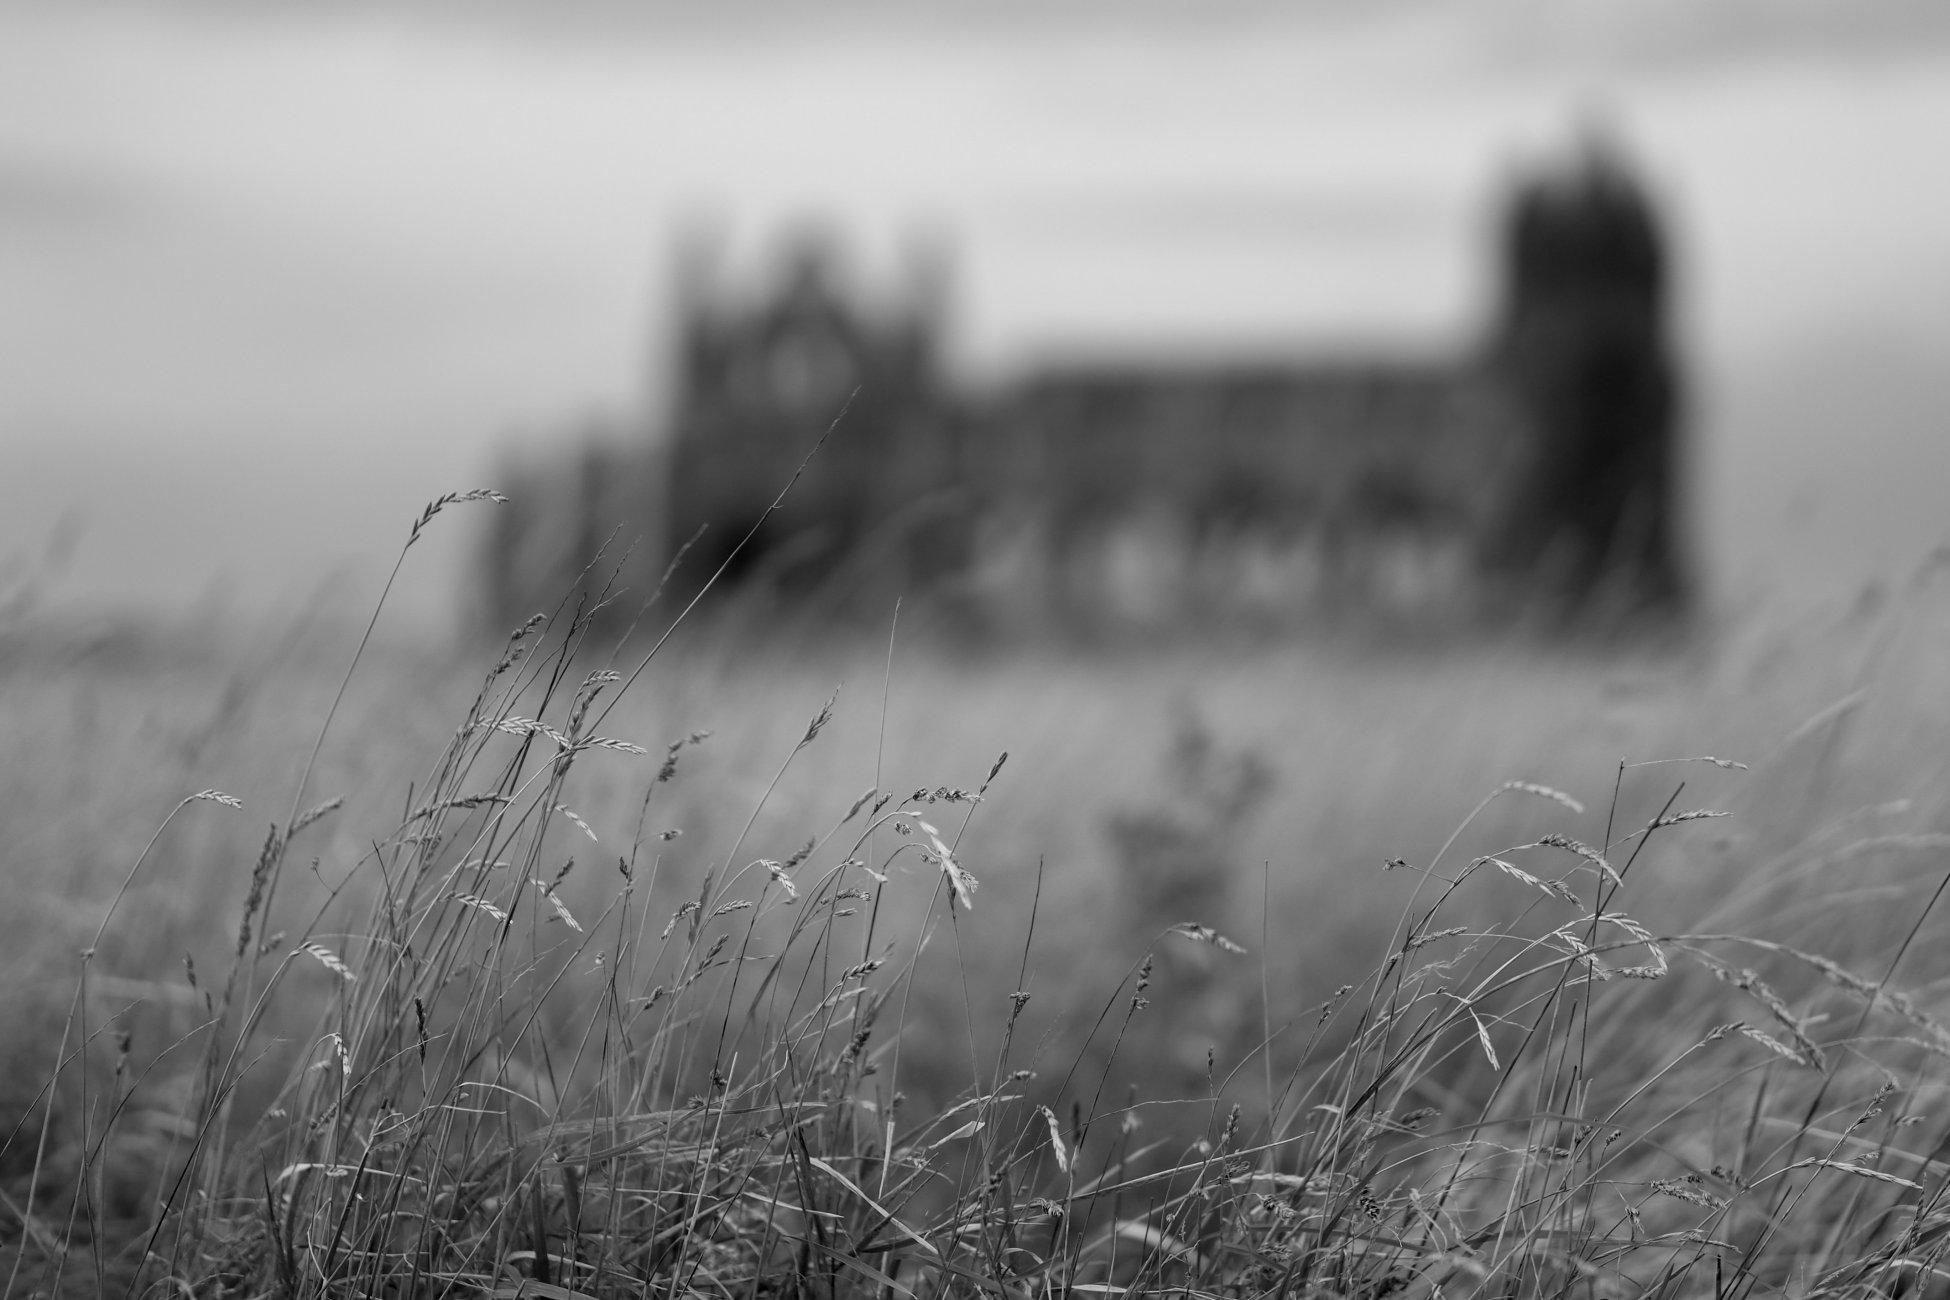 Autumn at Whitby abbey